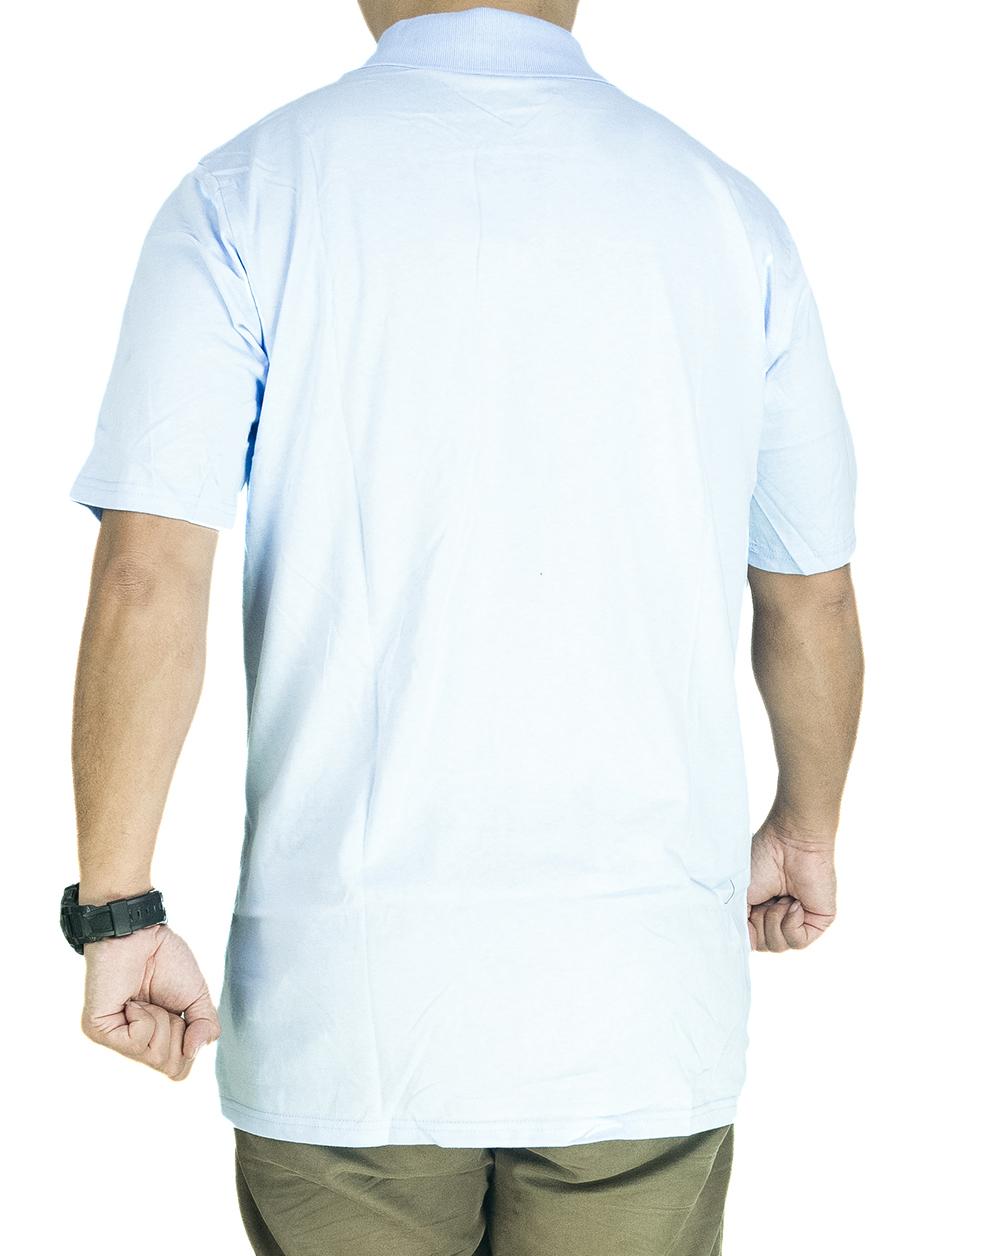 CY 3241 [ DARK BLUE / LIGHT BLUE ] MAN CASUAL POLO COLAR SHIRT BIG SIZE PLUS